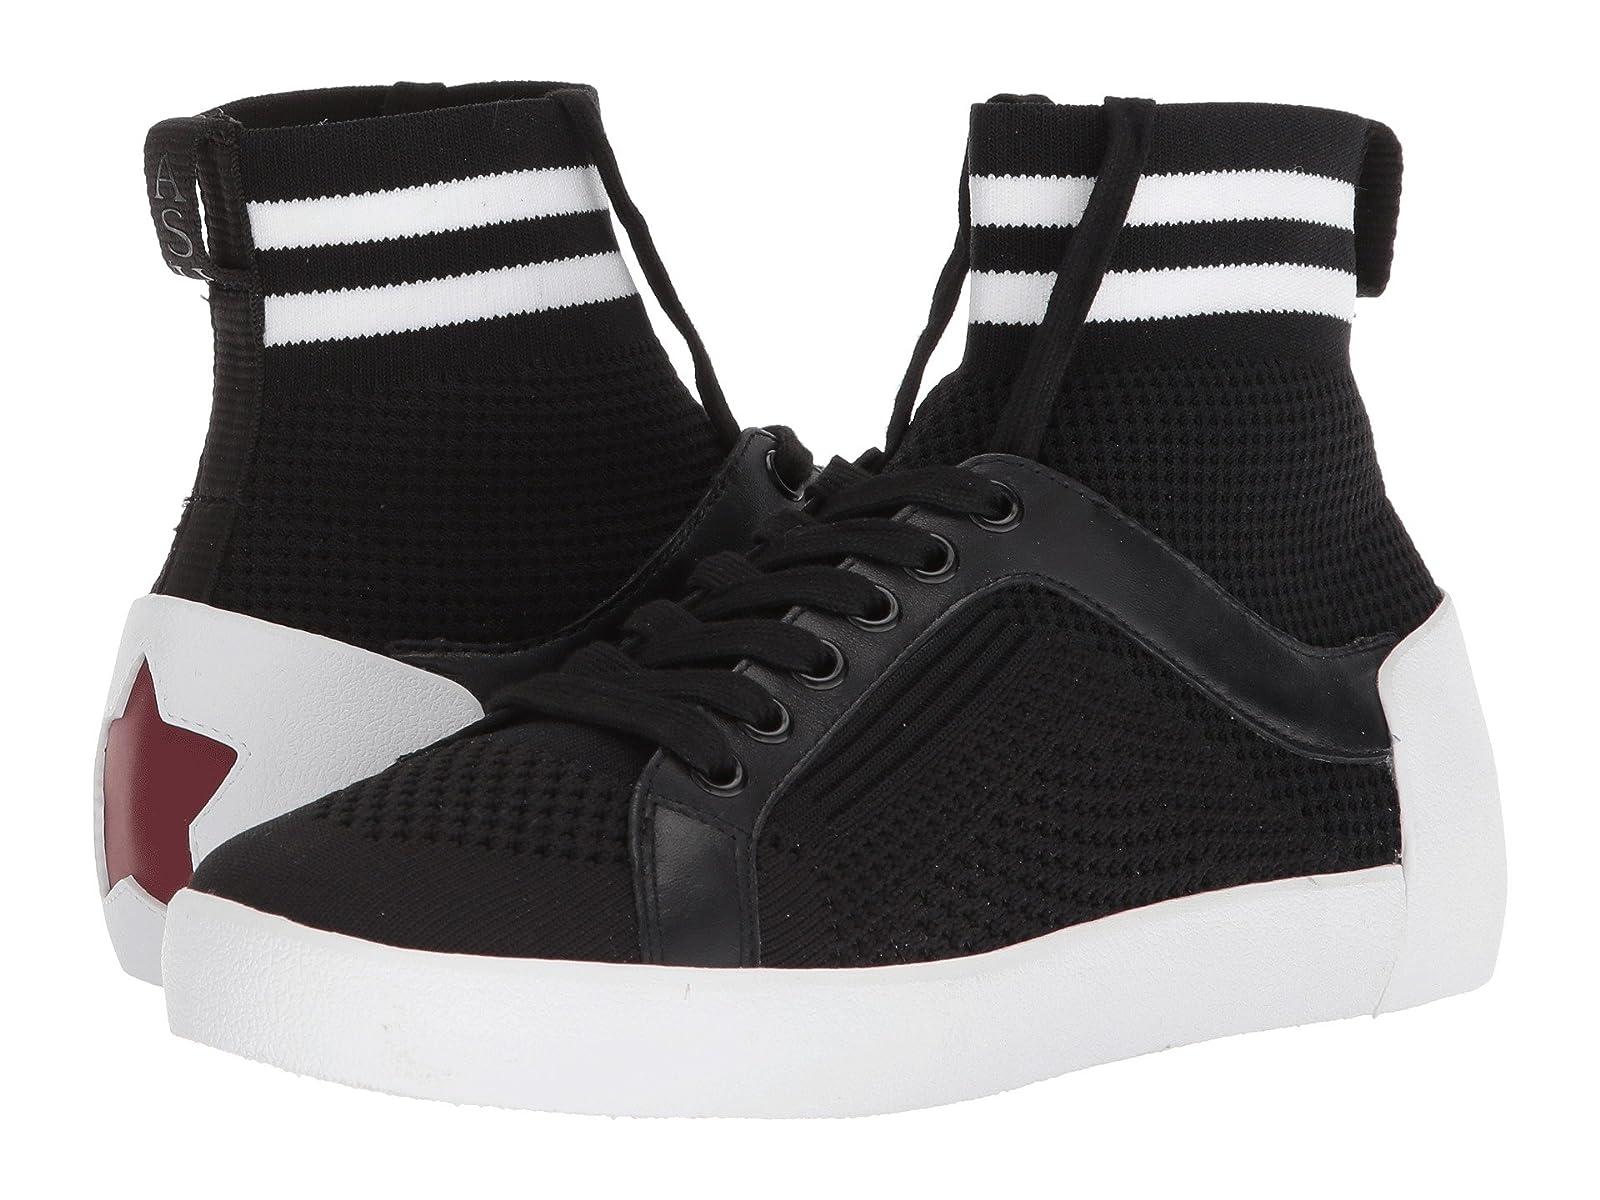 ASH NinjaCheap and distinctive eye-catching shoes